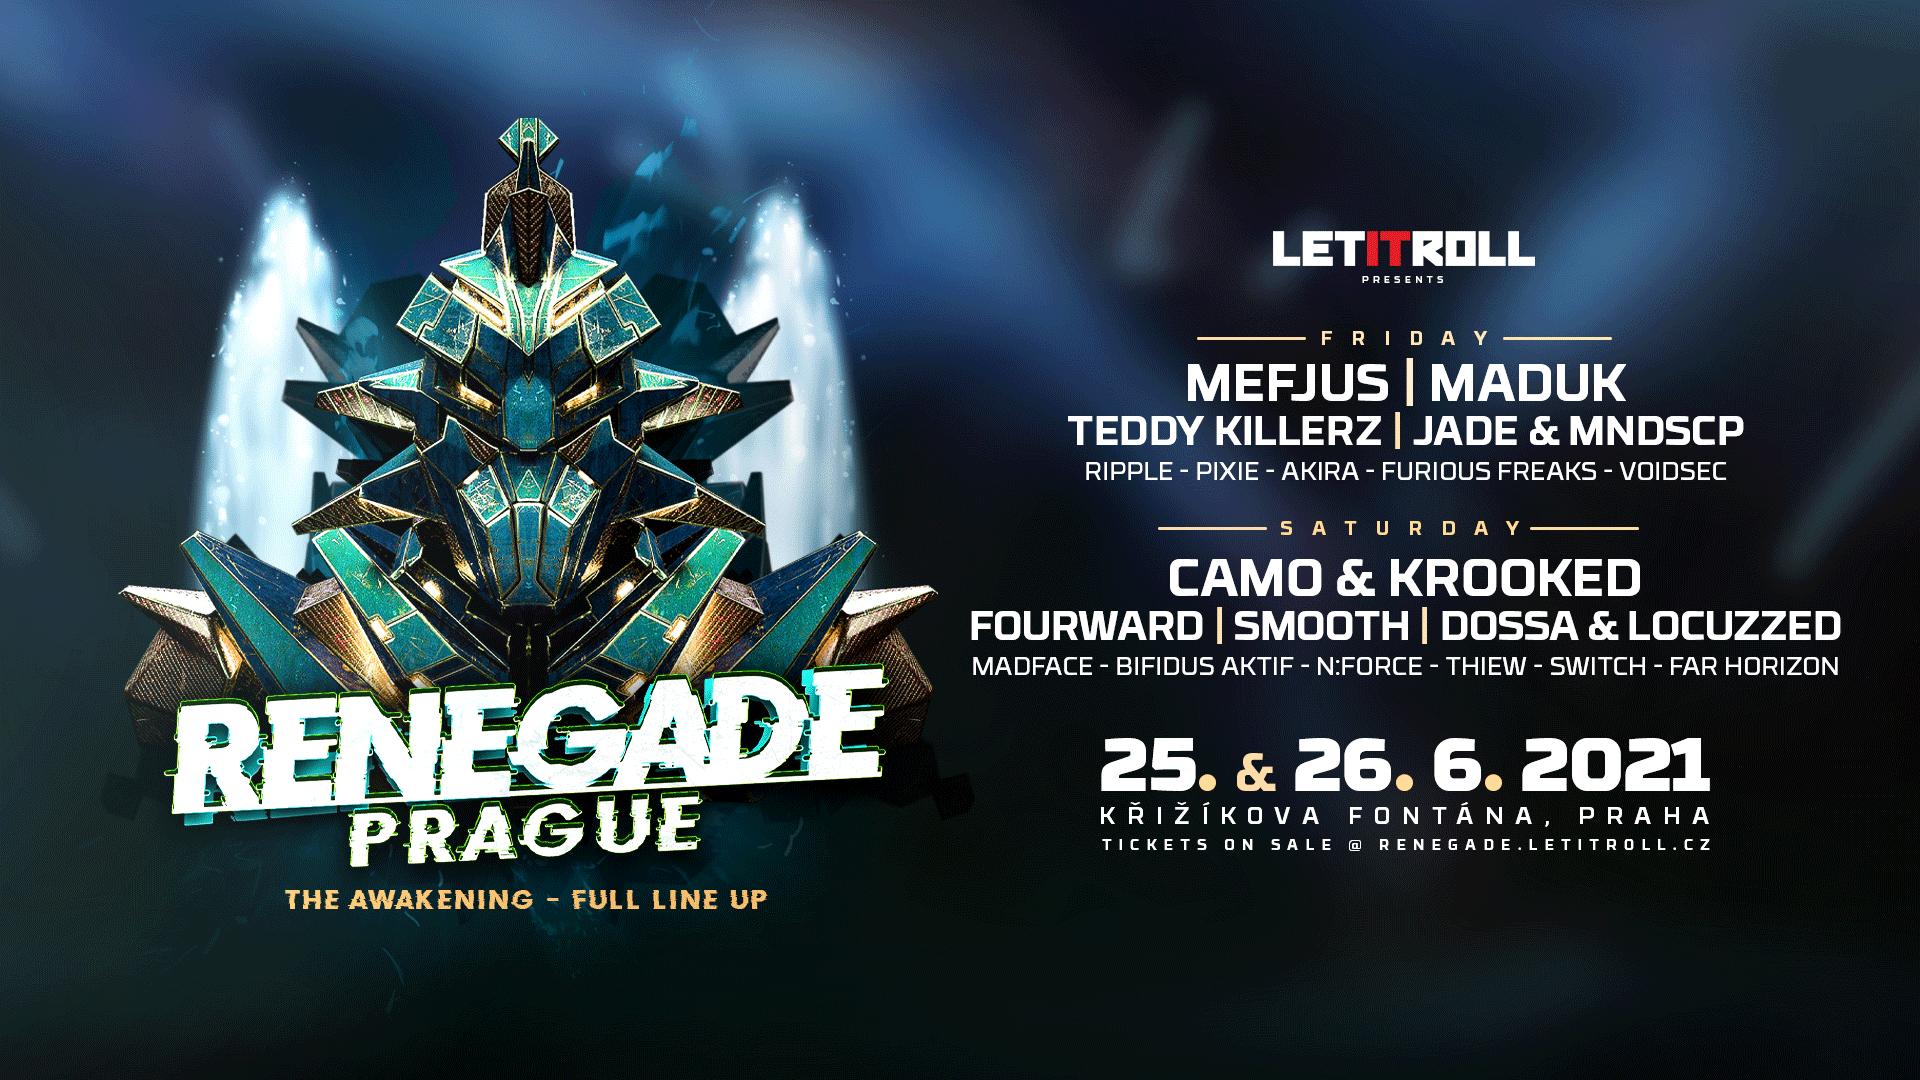 Let it Roll Renegade